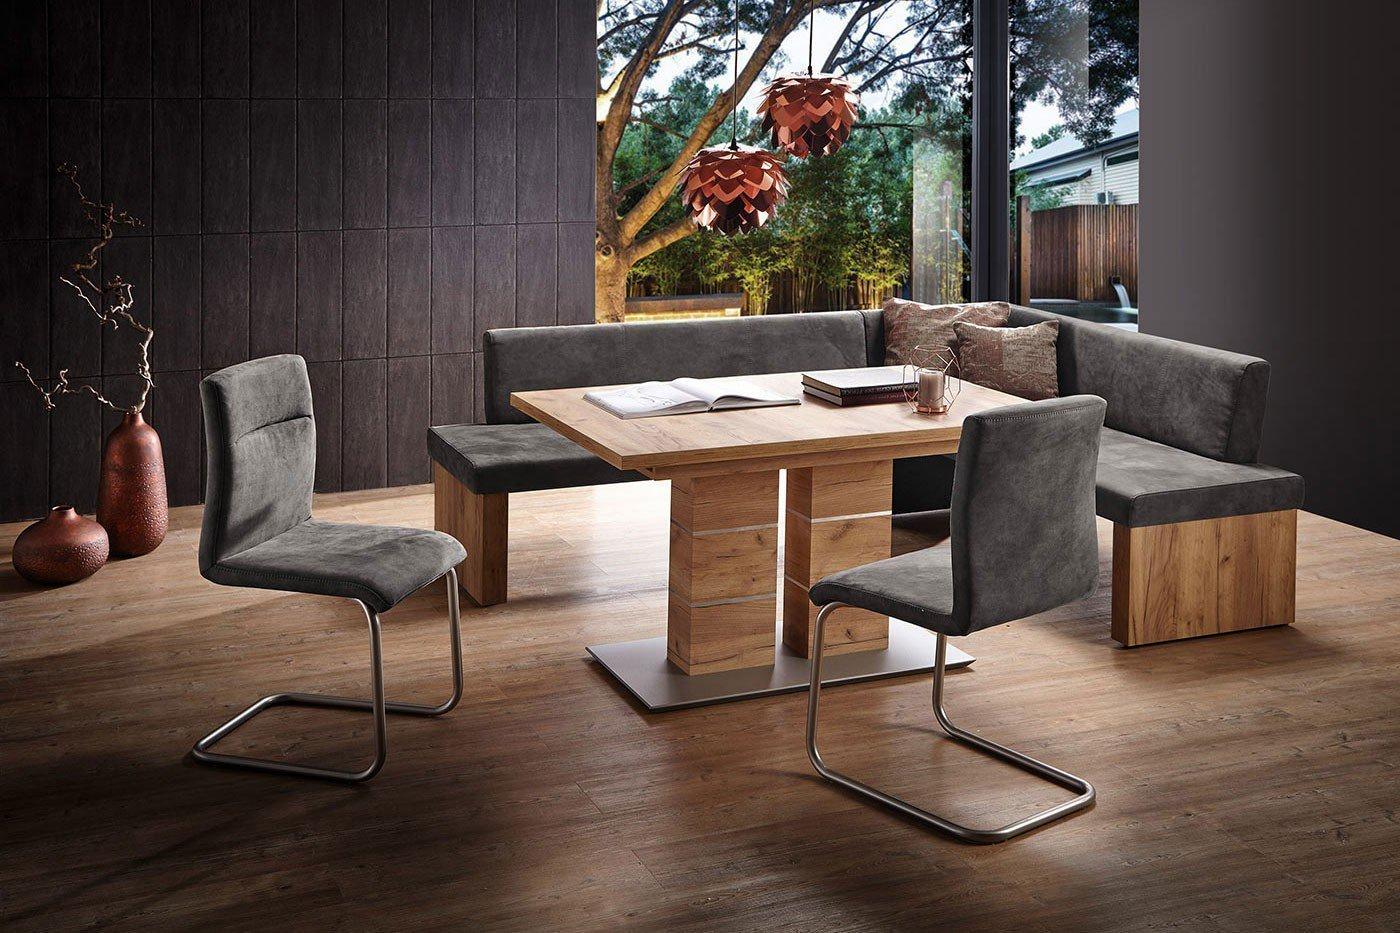 k w eckbank bonanza mit grauem microfaserbezug m bel. Black Bedroom Furniture Sets. Home Design Ideas